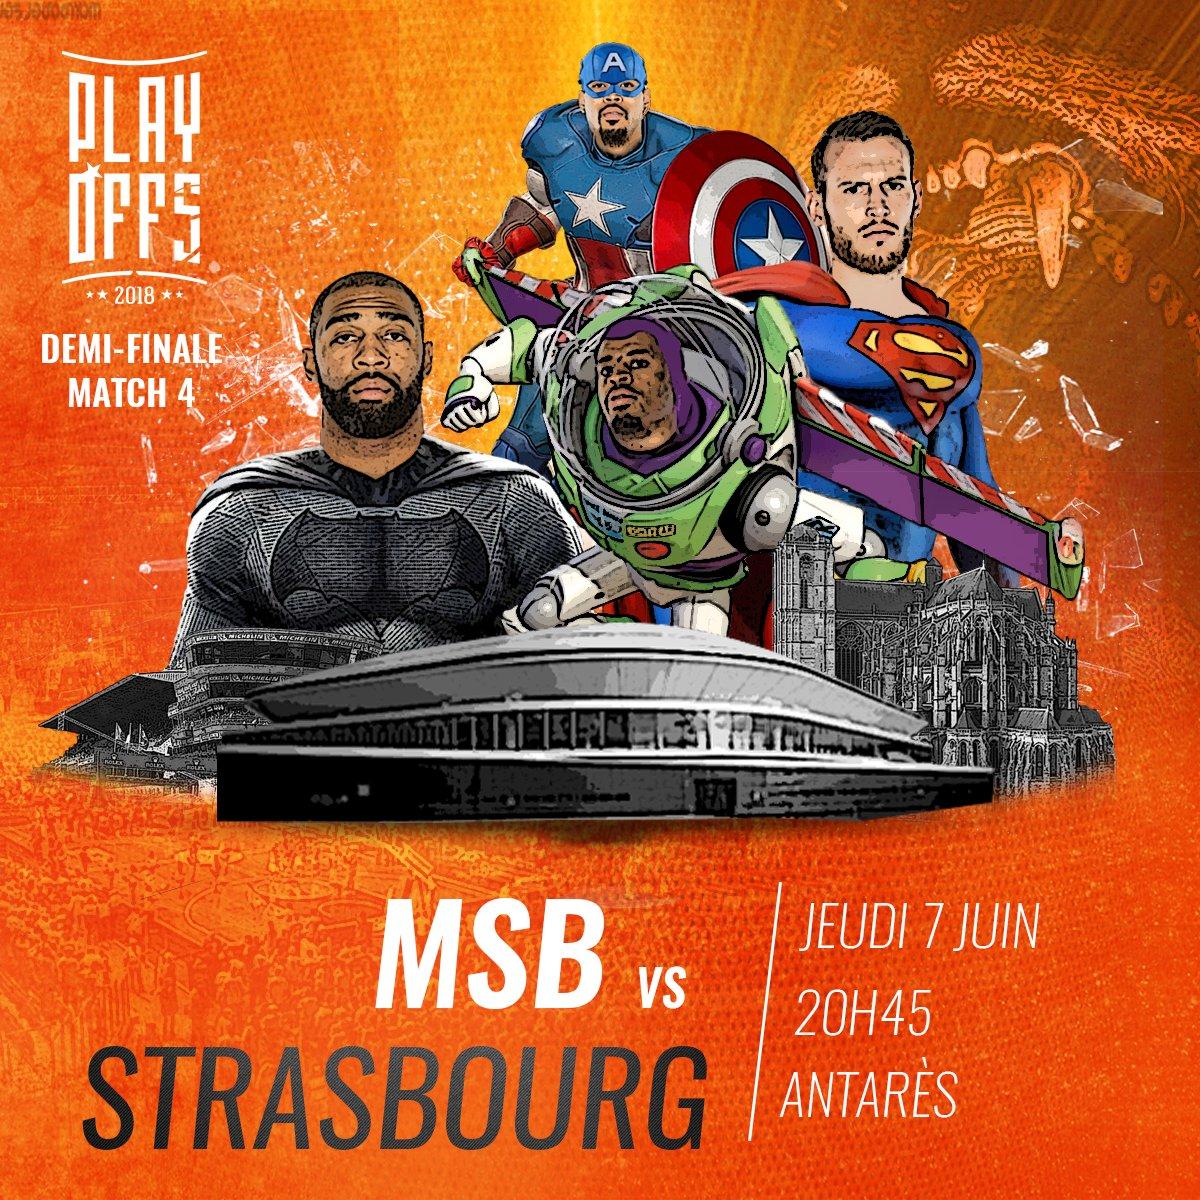 [1/2 finale PO] Strasbourg - MSB / live SFR Sport 2 - Page 7 DfE2PwUX4AAJ6mJ?format=jpg